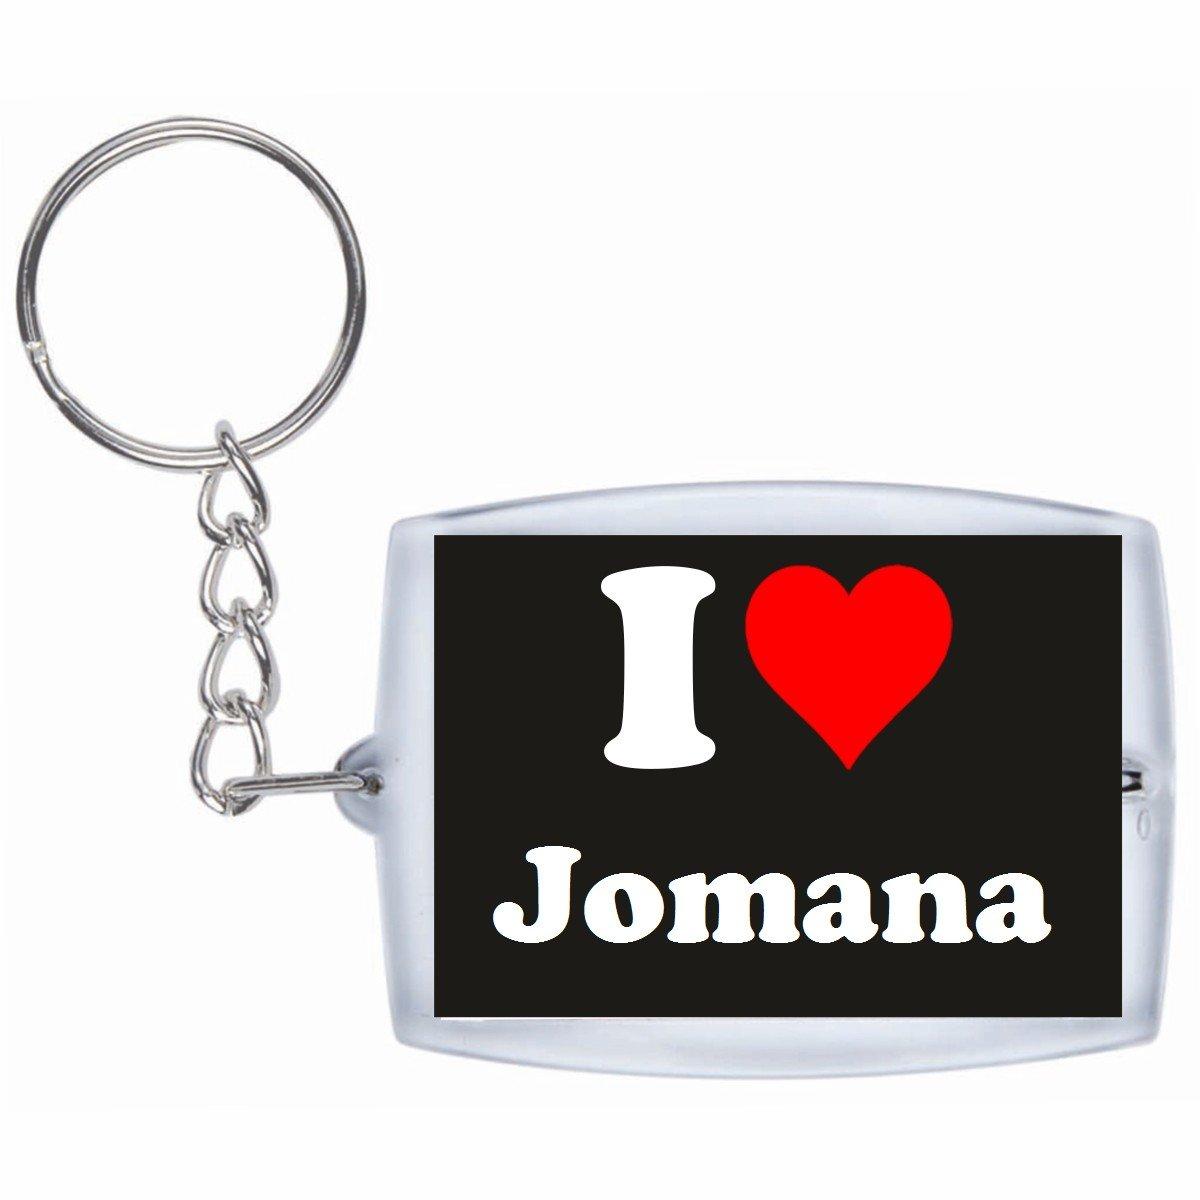 صور معنى اسم جومان , مرادف وتفاصيل اسم جومان